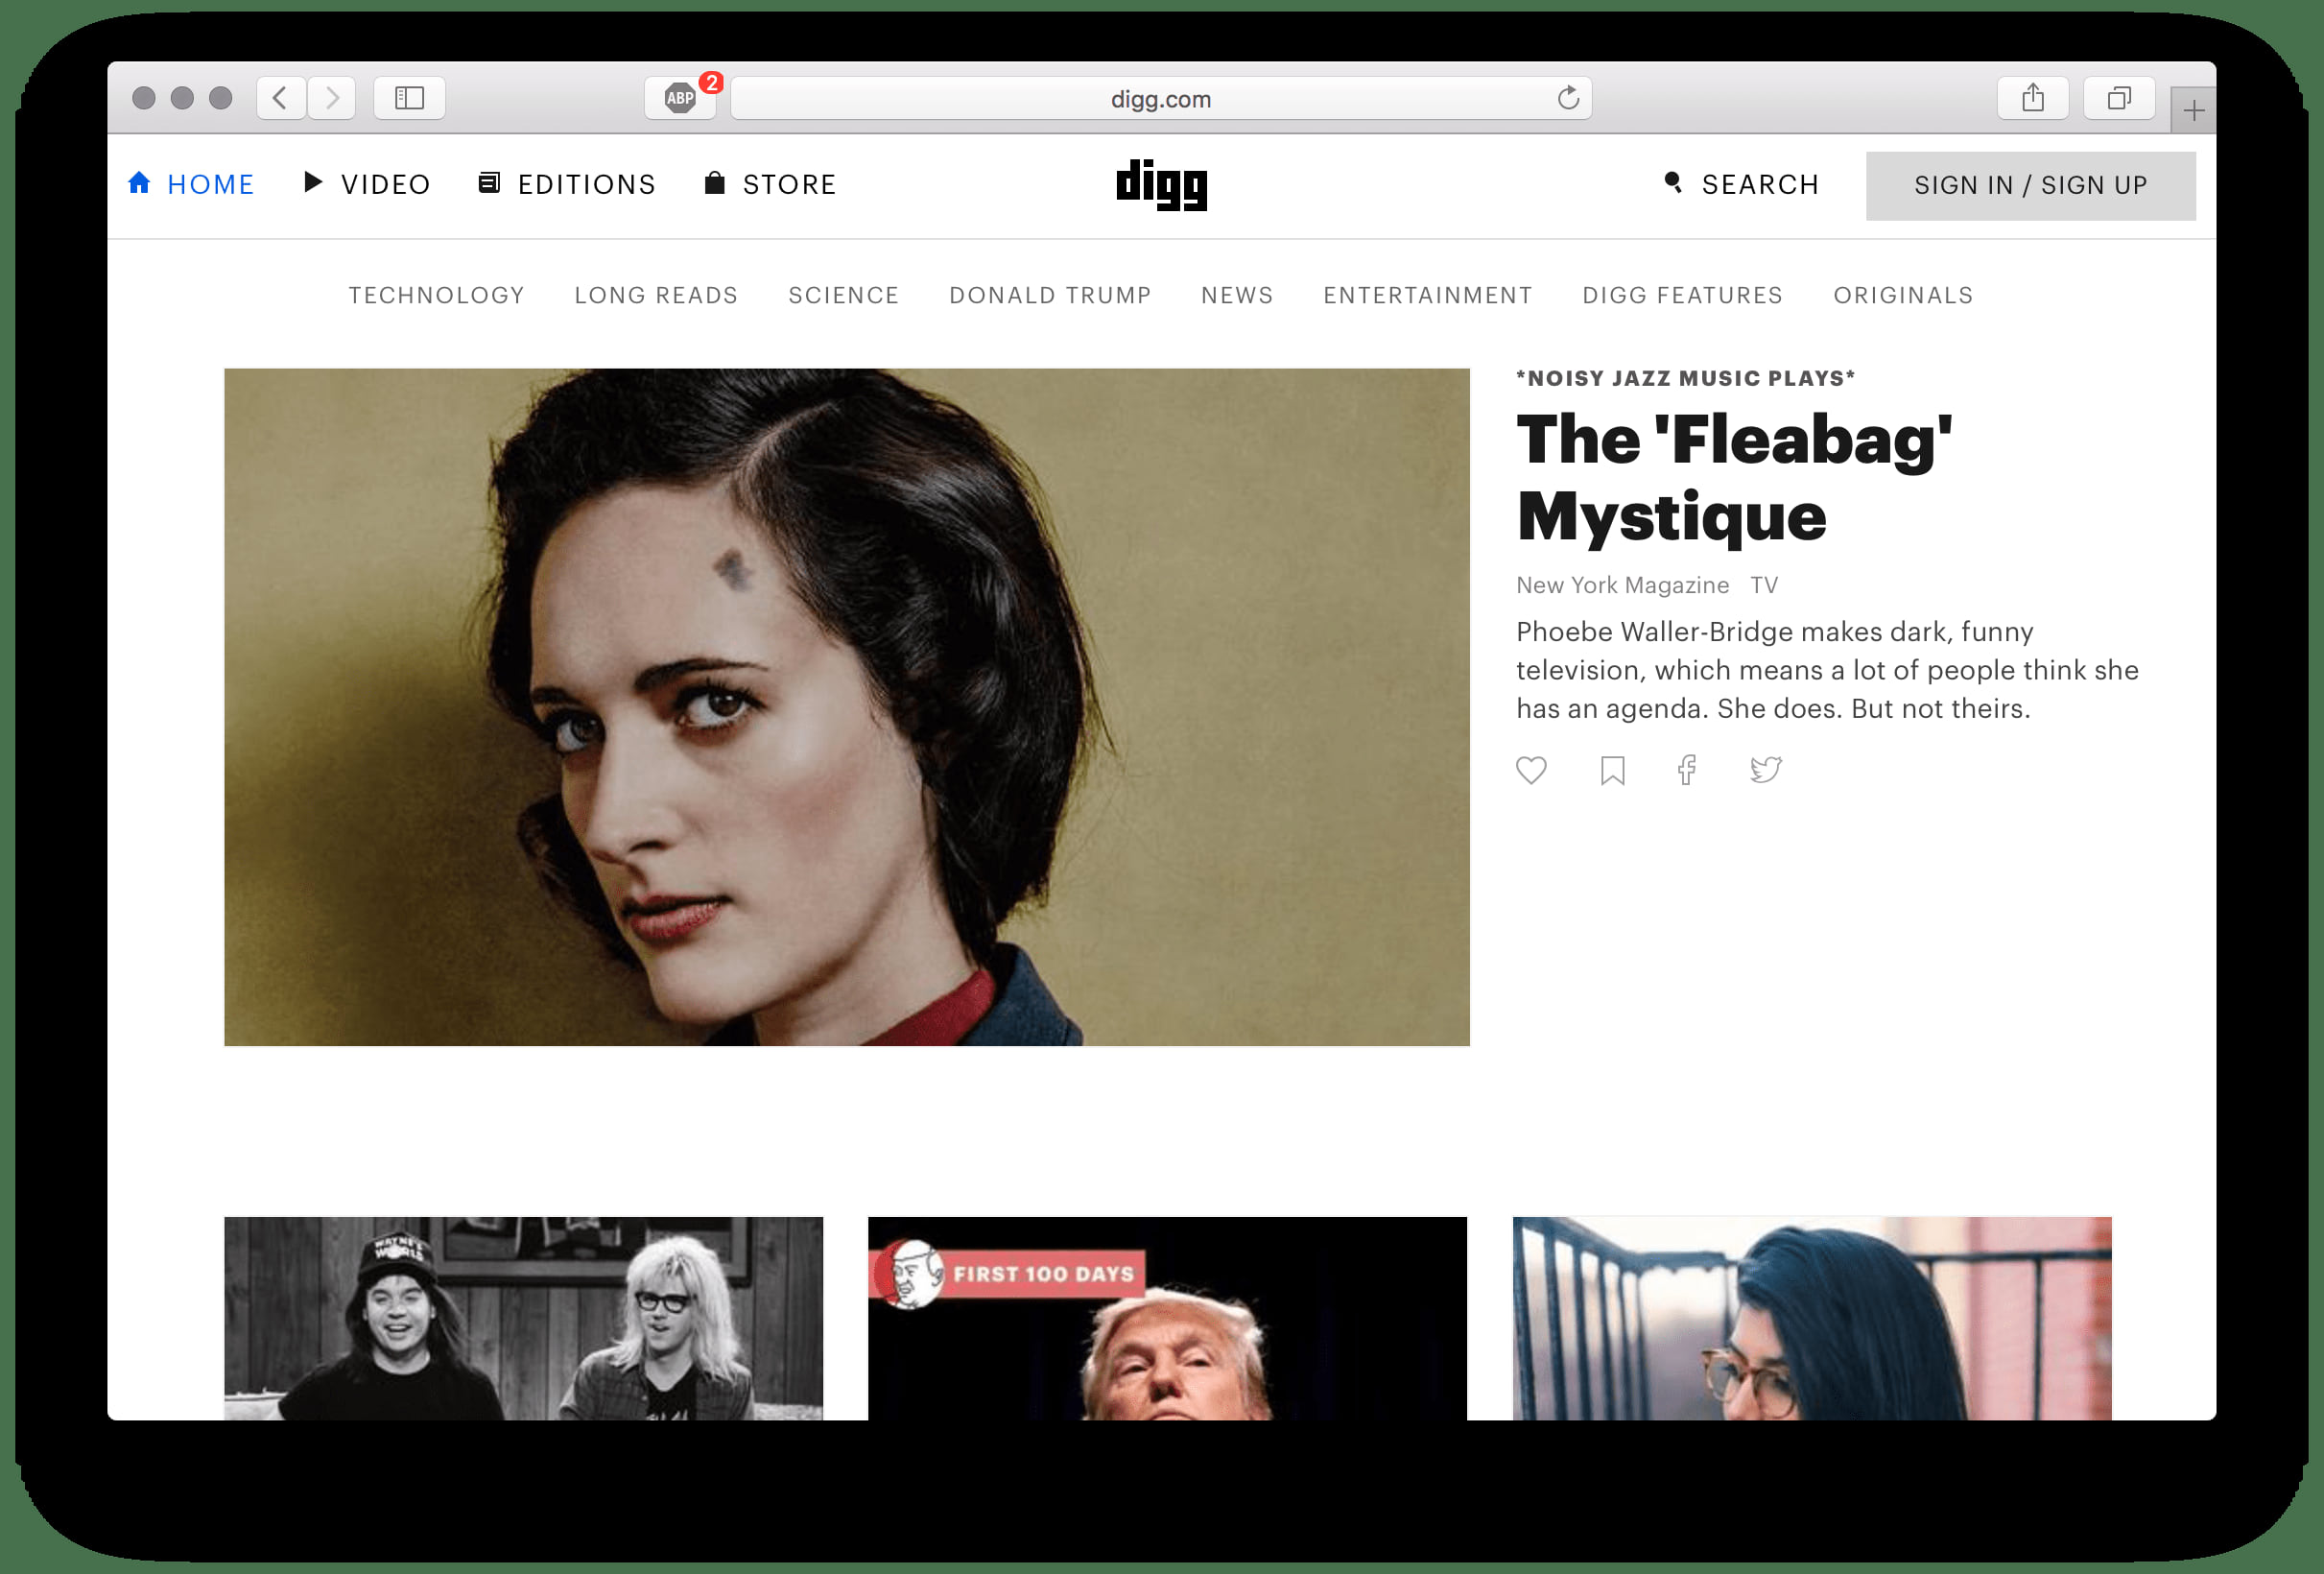 Сайт digg.com